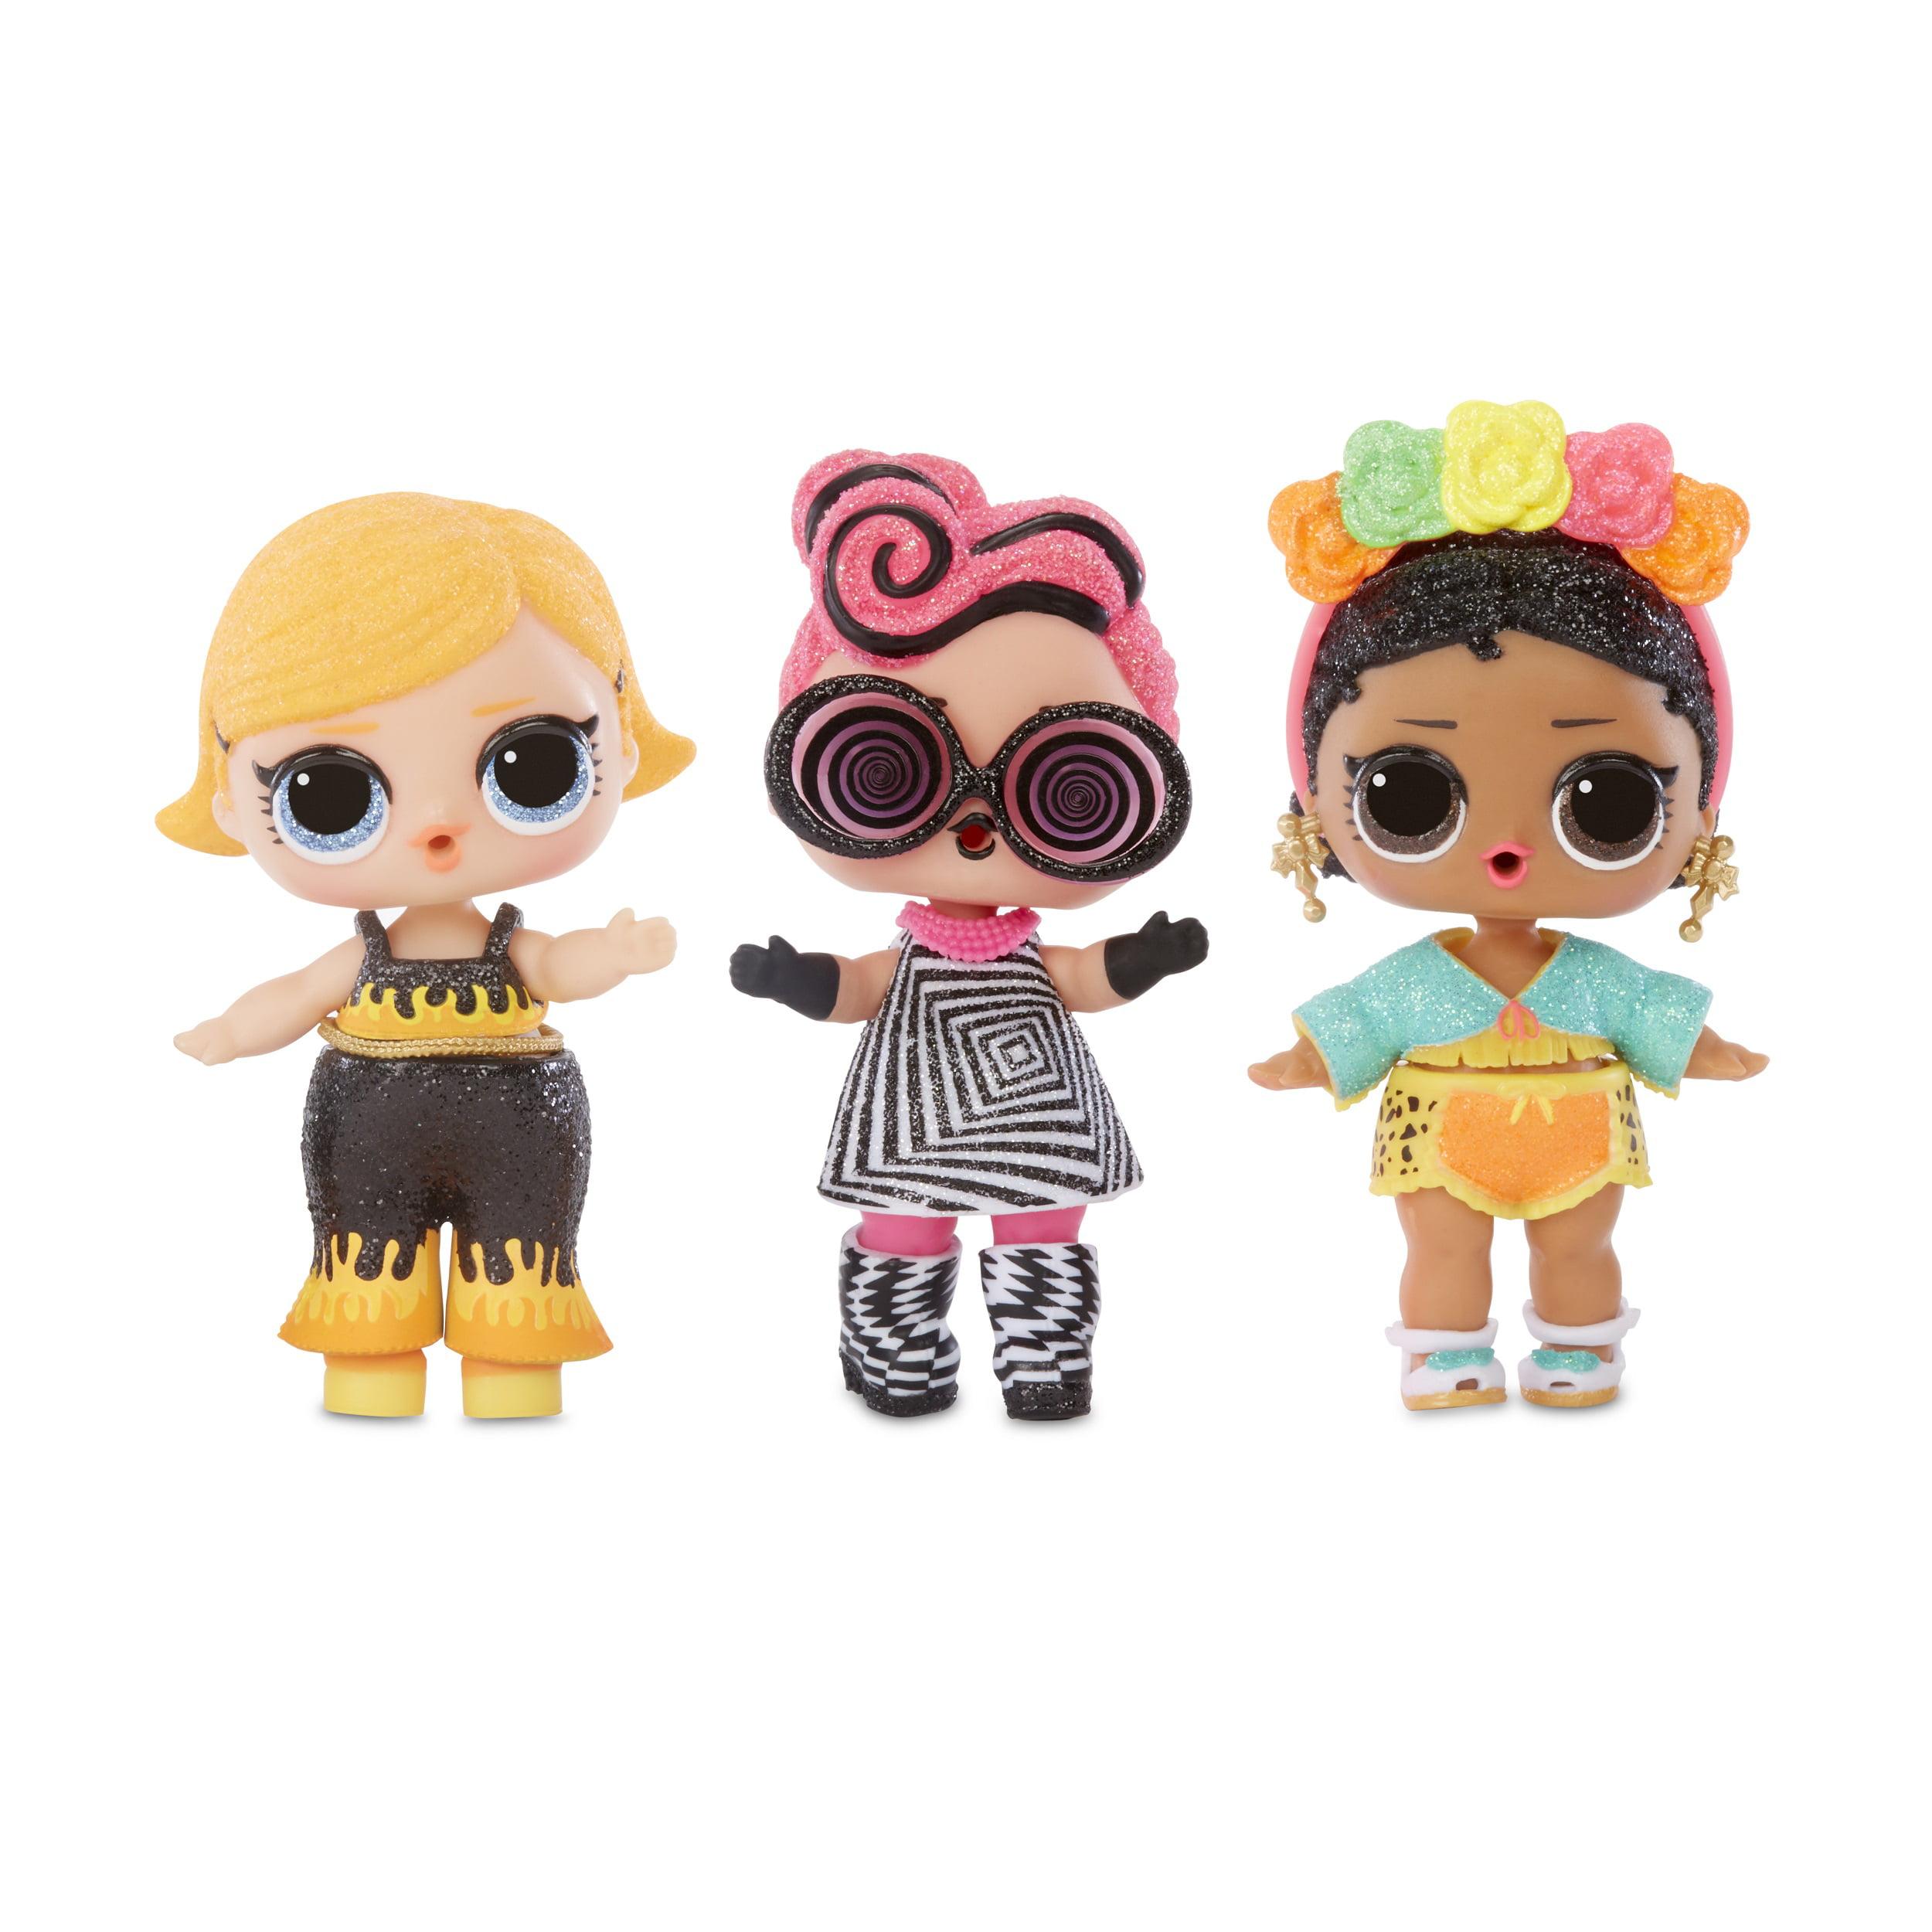 NEW Lol Surprise Lights Glitter Dolls Set Of 2 Surreal Bebe and Yacht B.B L.O.L